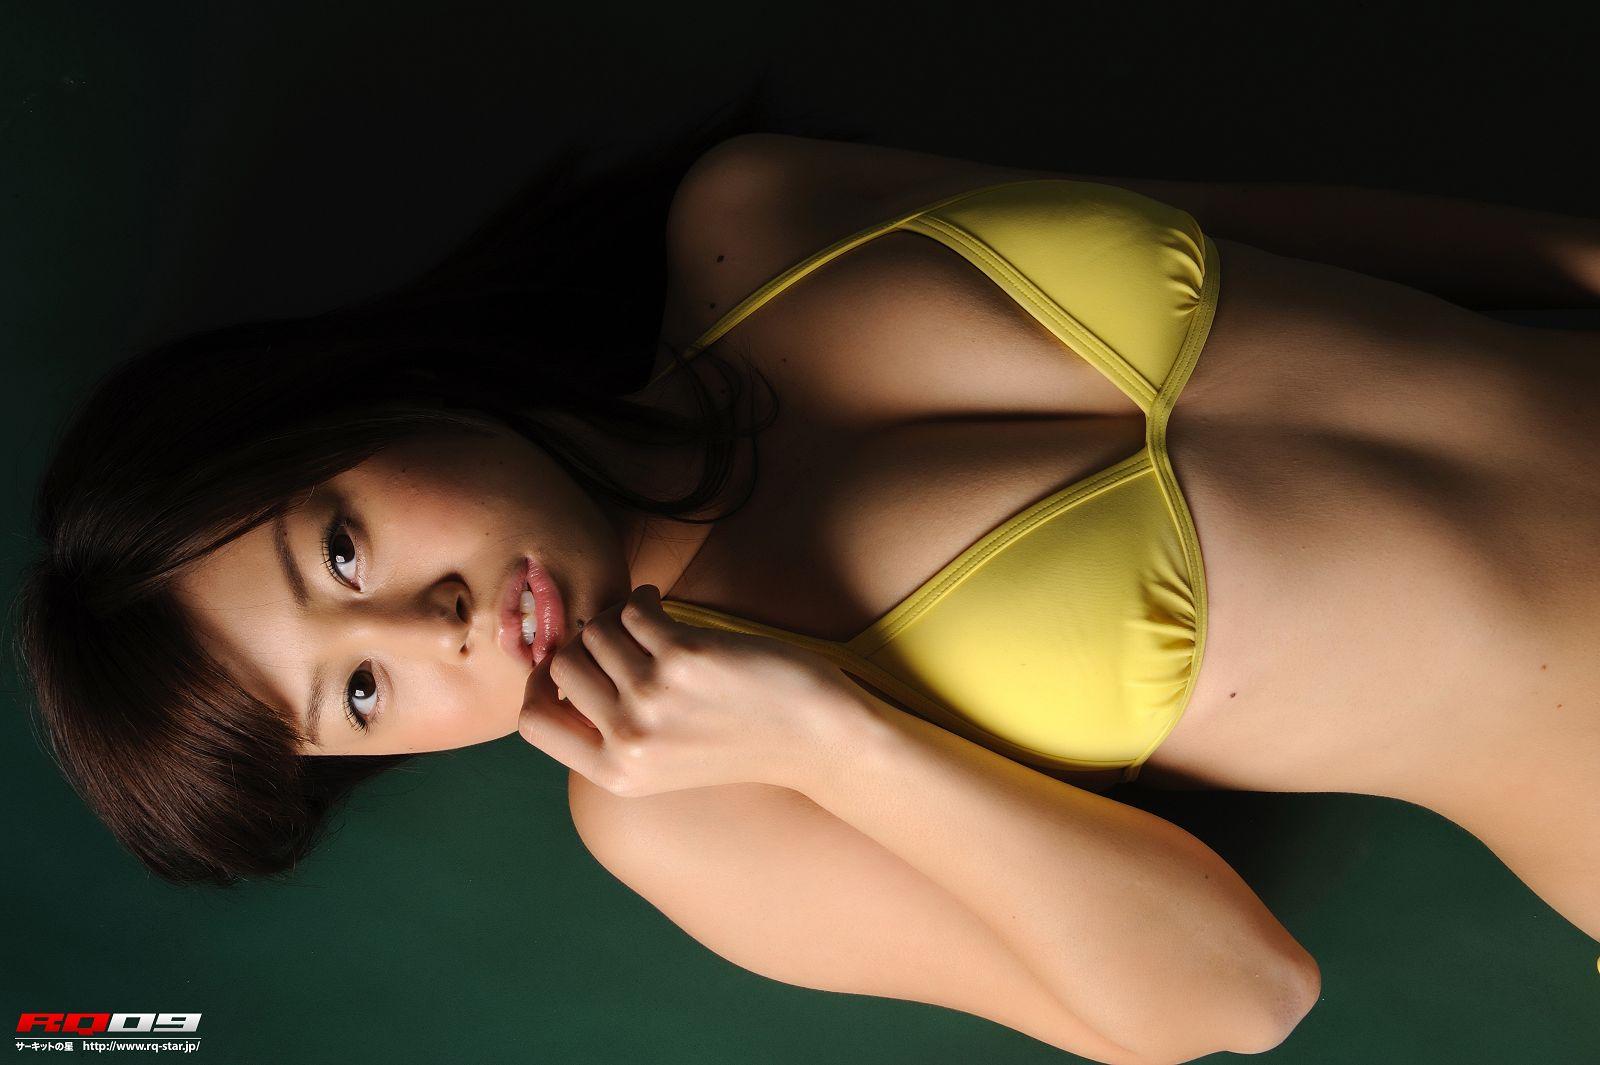 [RQ STAR美女] NO.0156 Airi Nagasaku 永作あいり Swim Suits[103P] RQ STAR 第4张